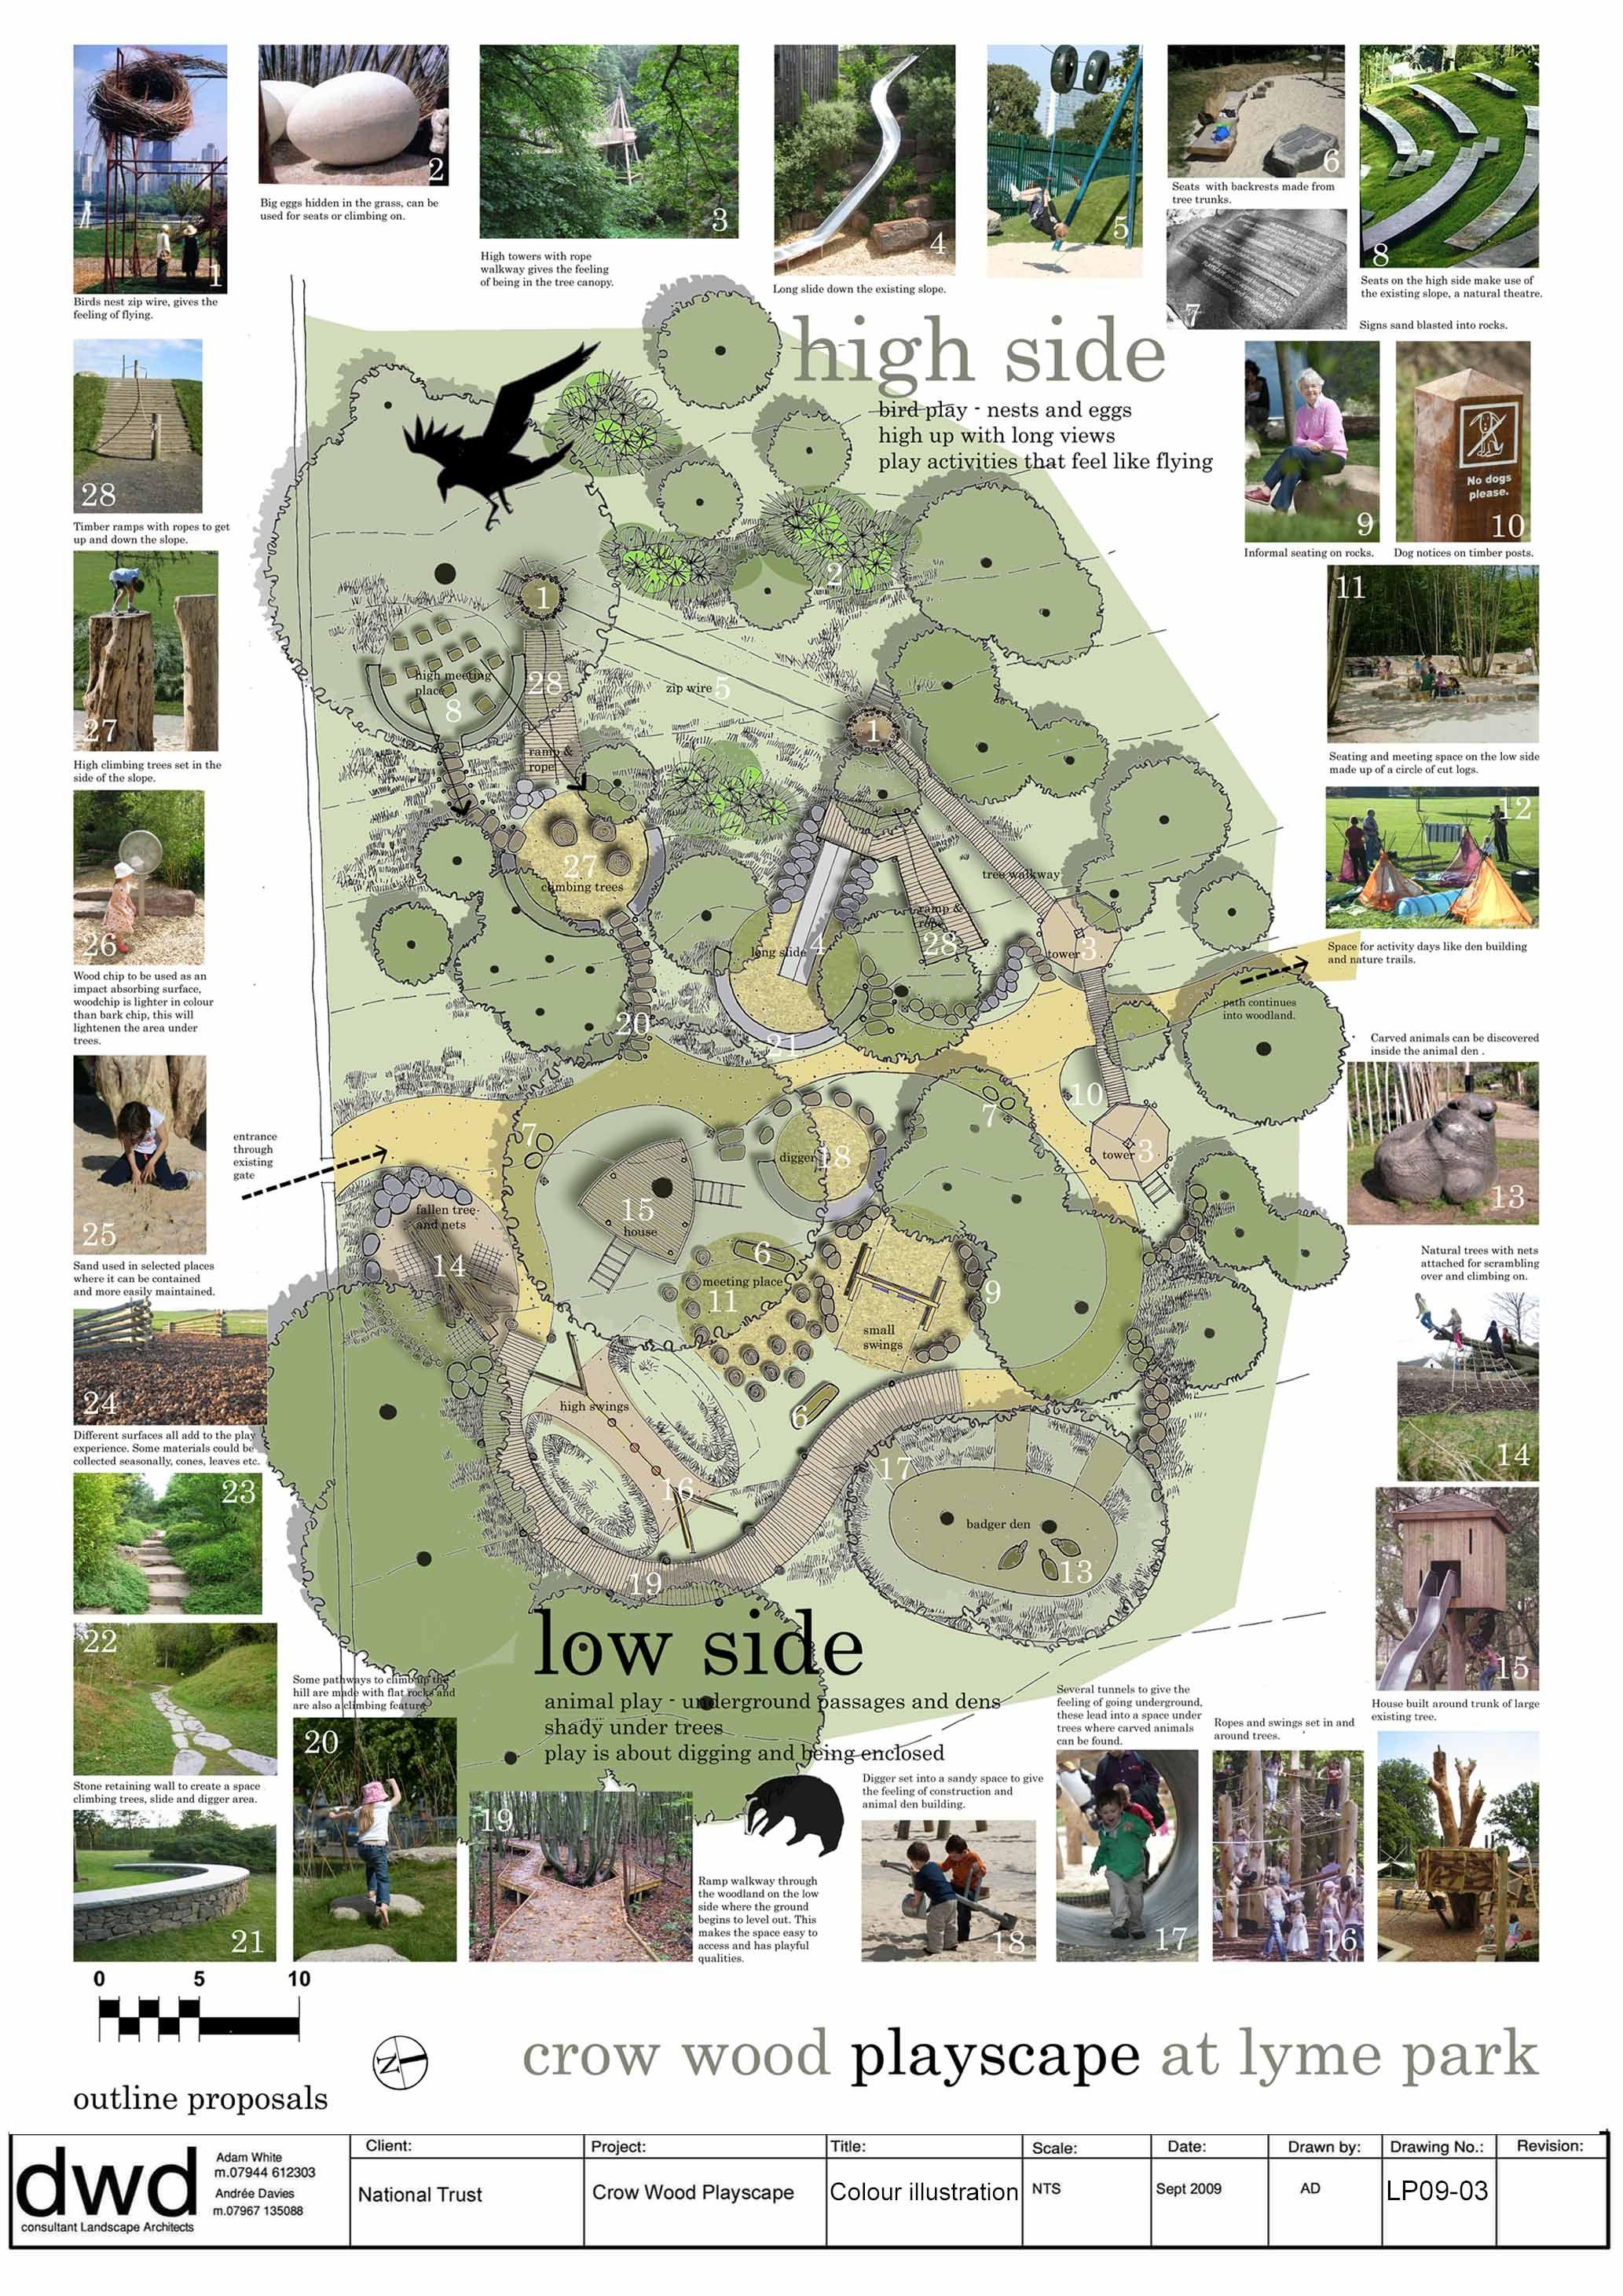 Davies White Landscape Architects Kingston, Surrey